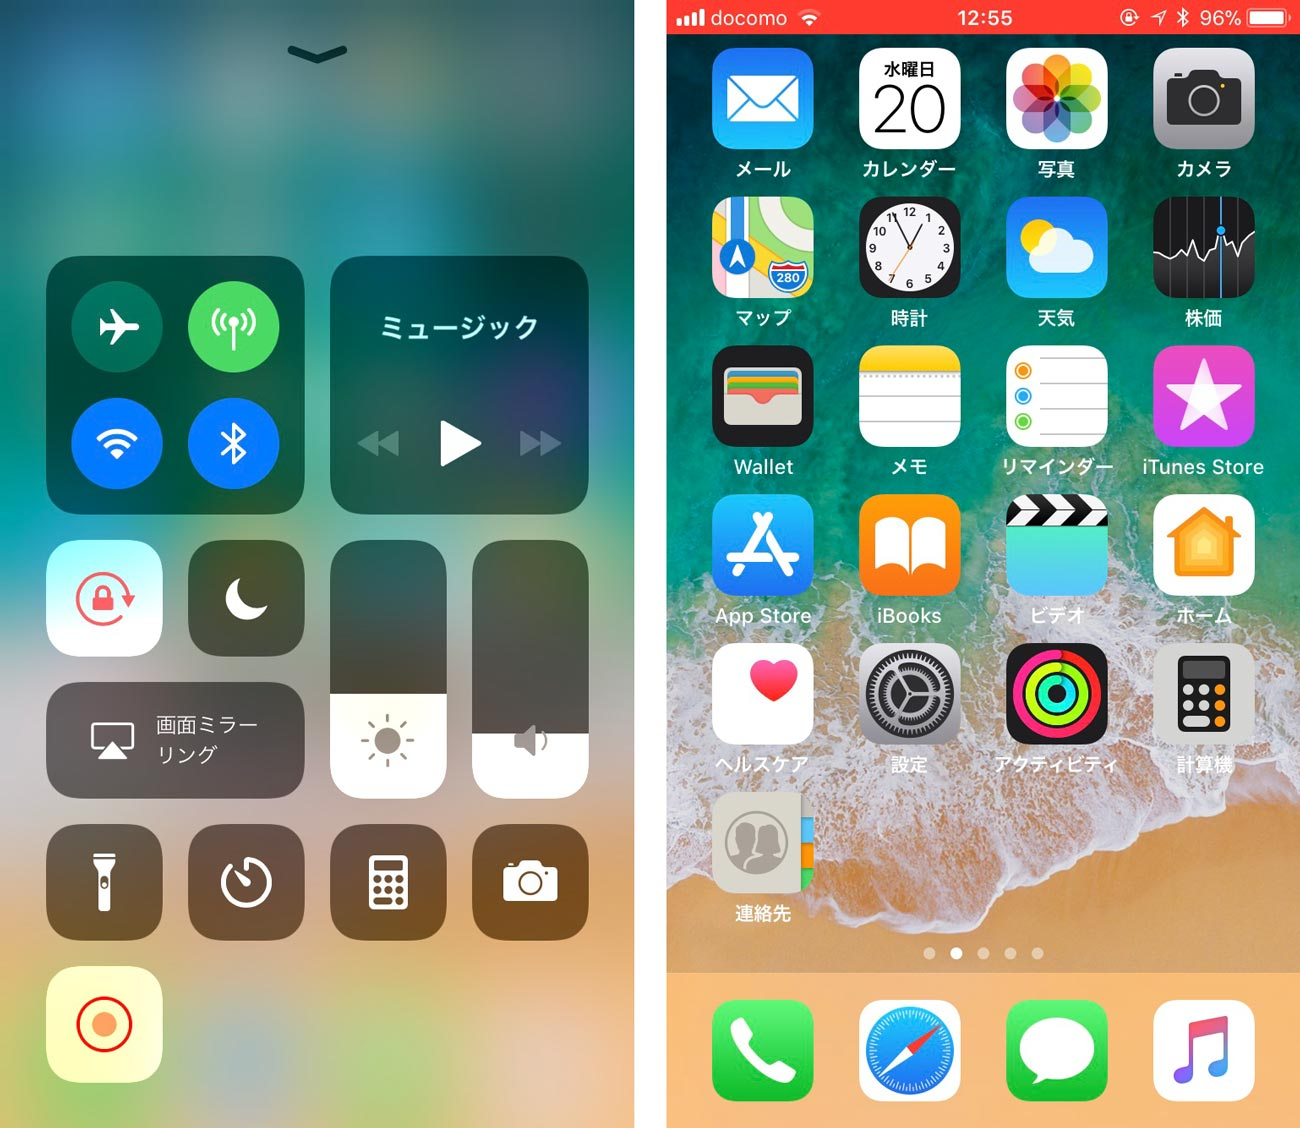 録画収録 開始 iOS11